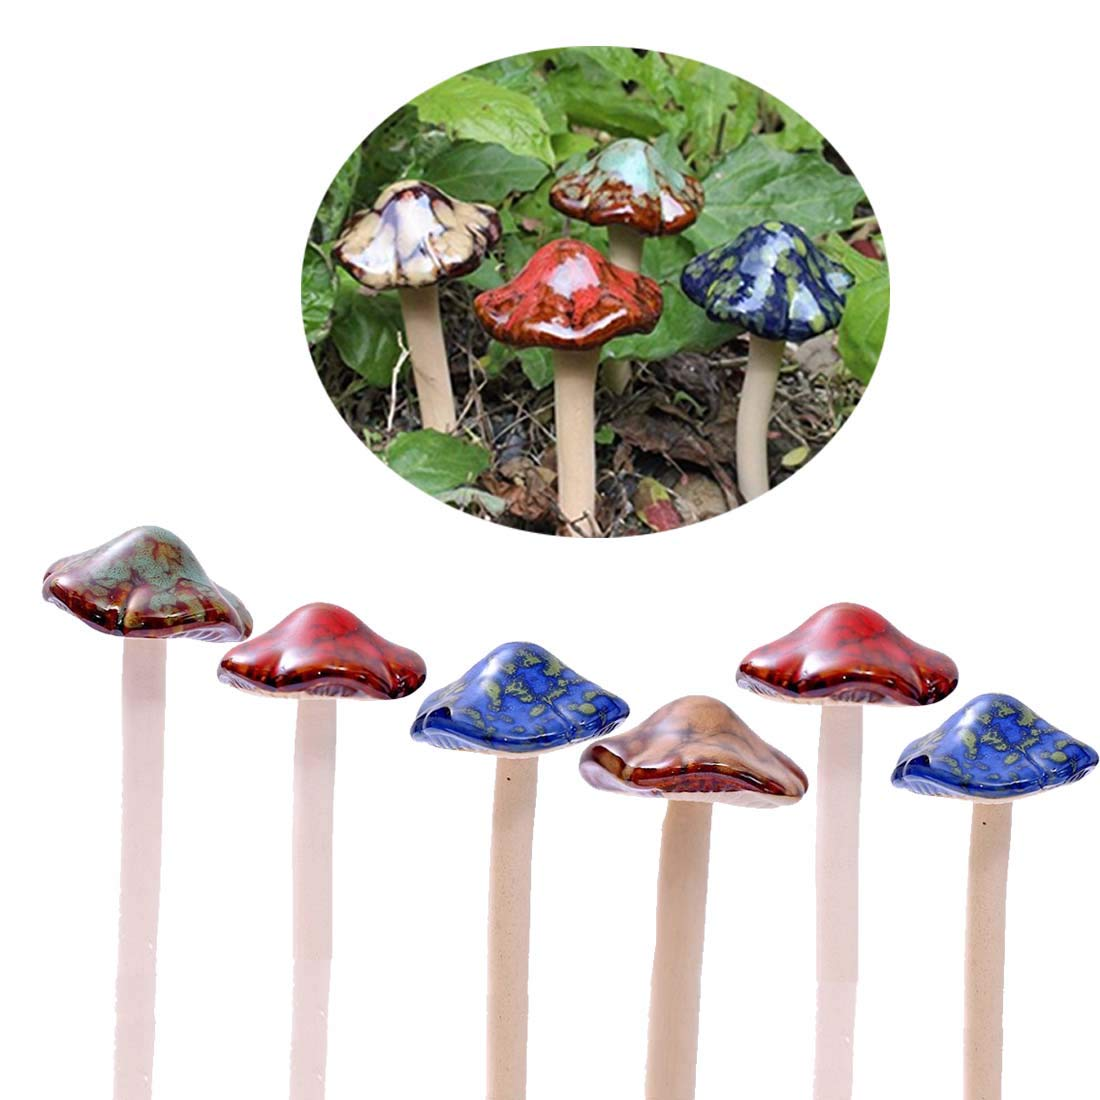 Colorful Garden Mushrooms, ENVEL Fairy Garden Mushroom Toadstool Ceramic [ 4-Colour 6-Pieces ] Garden Pots Decoration Pottery Ornament for DIY Dollhouse Potting Shed Flowerpot Plants Statue